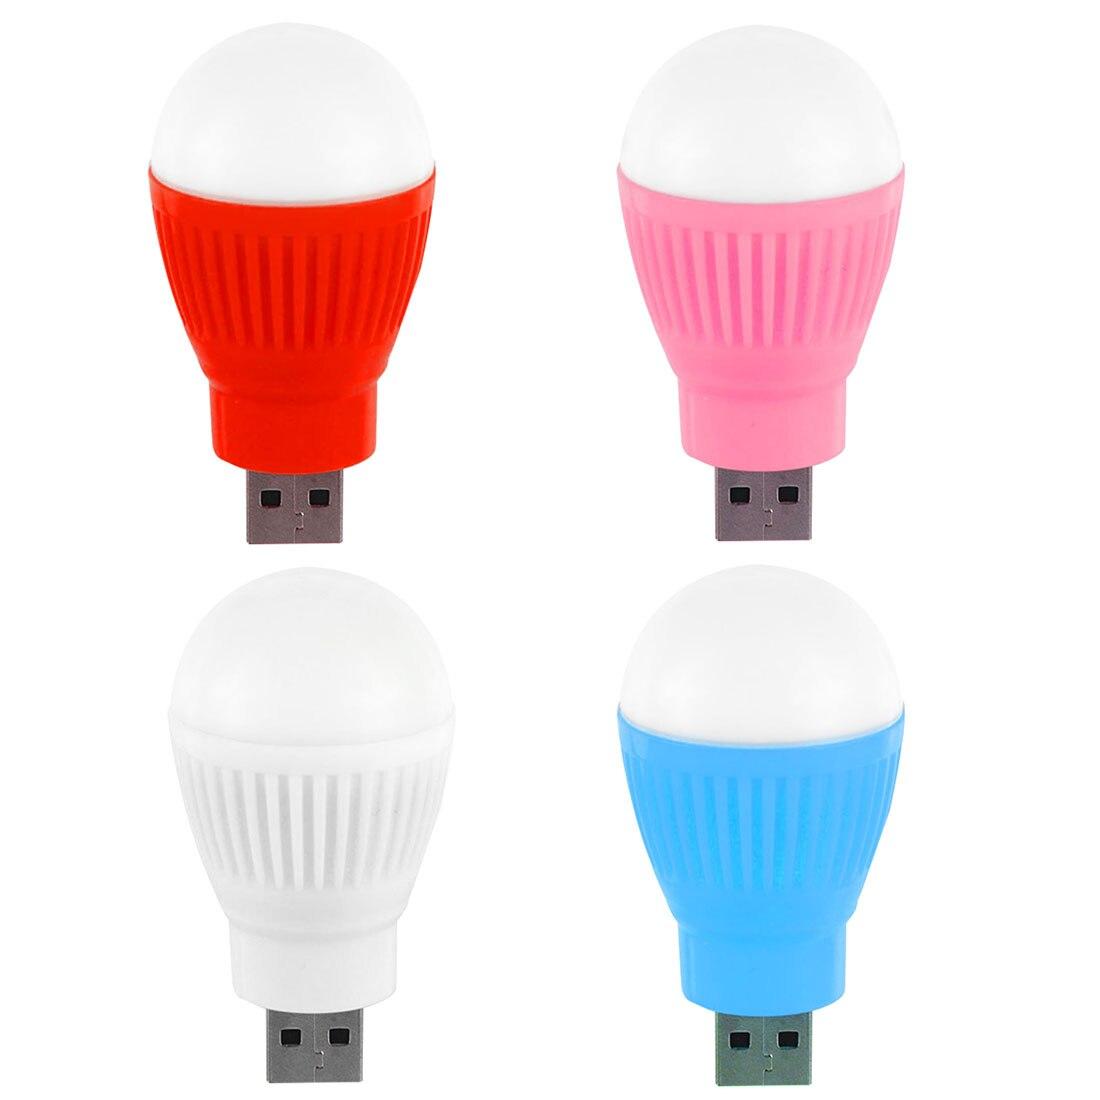 Energy Saving Reading Light 1pc Mini USB LED Bulb Round Outdoor Flashlight Emergency Lamp Laptop Computer Camping Lamp